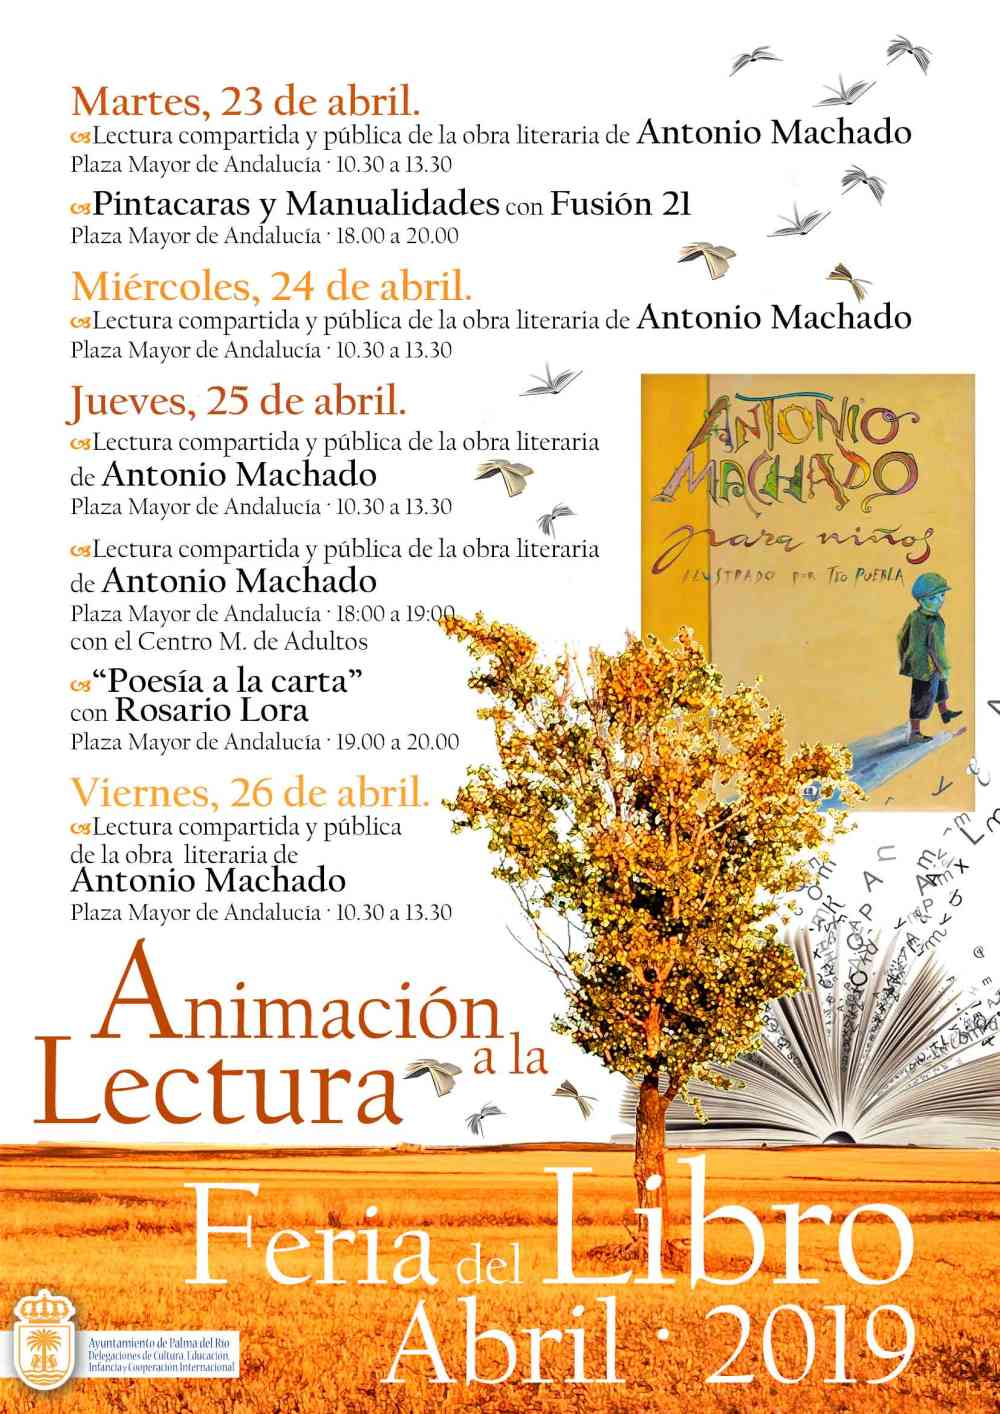 https://www.palmadelrio.es/sites/default/files/web-feria-libro-animacion-2019.jpg